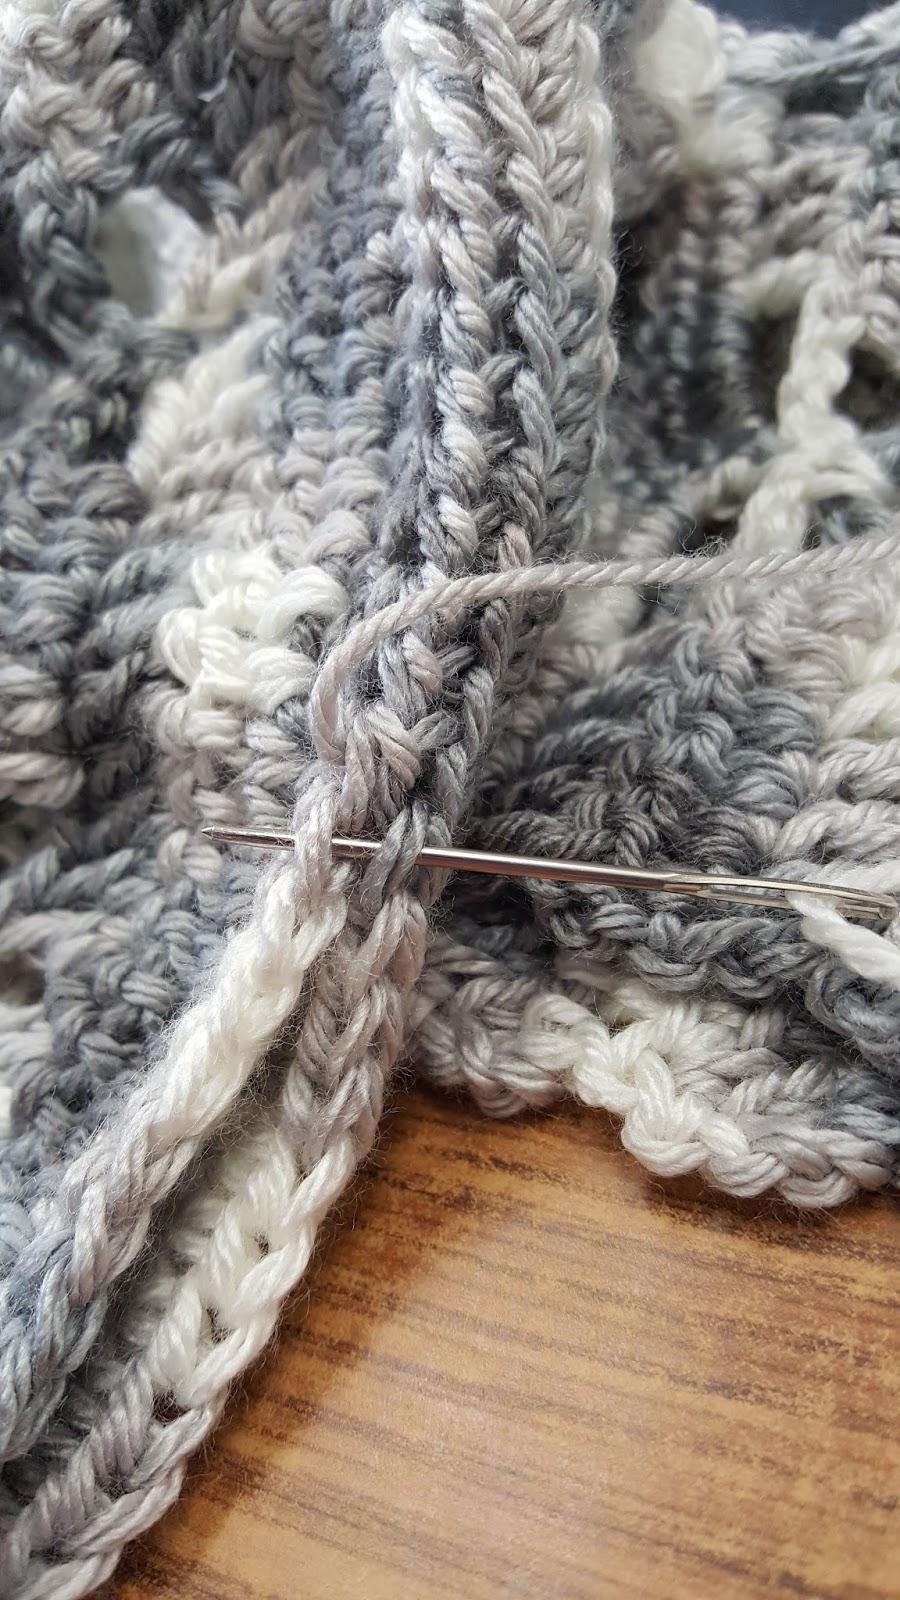 Fran's Crochet Place: Crochet Dragonfly Infinity Scarves